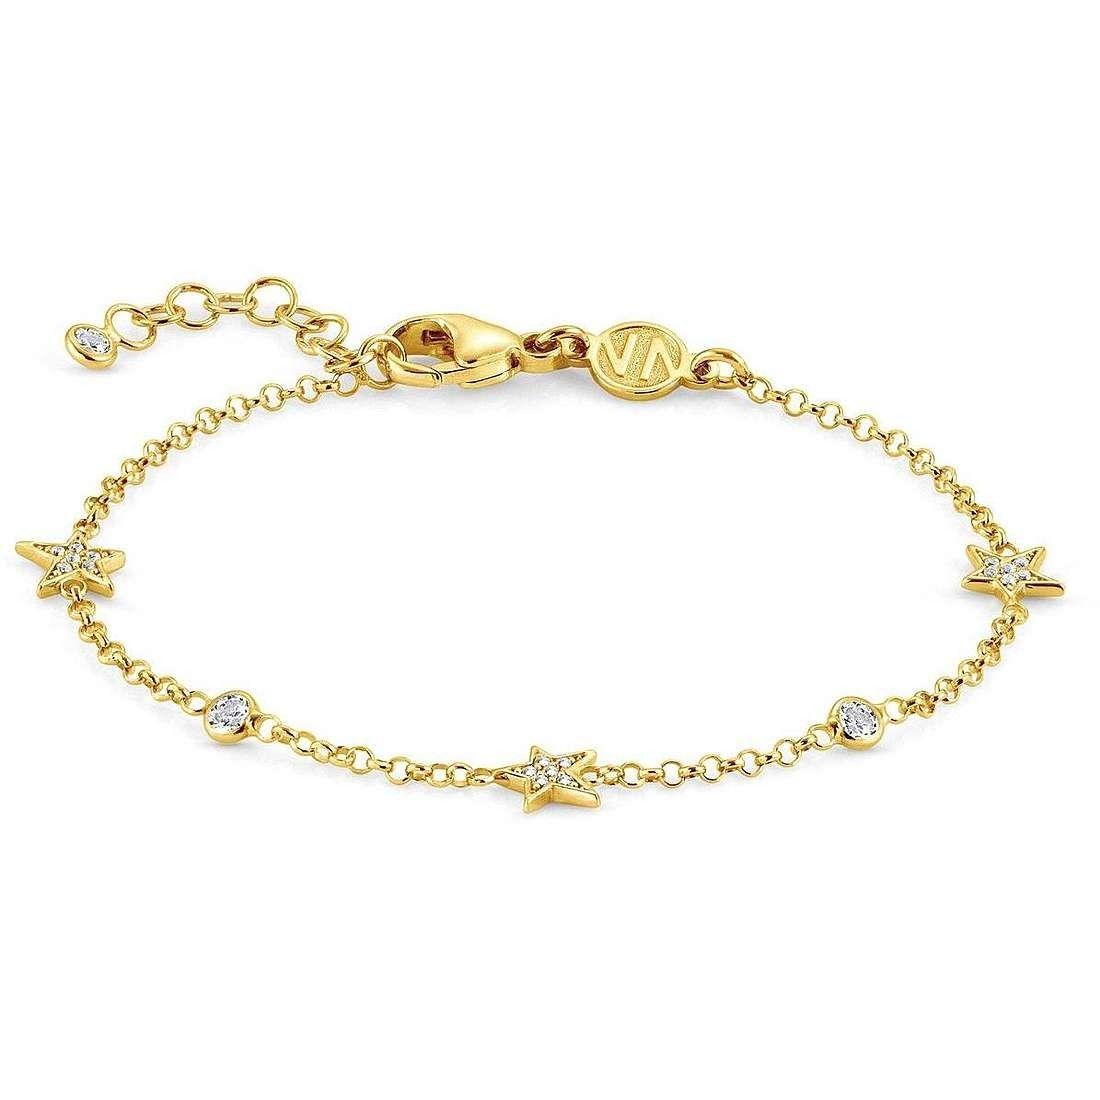 Nomination bracciale argento ref. 146706/012